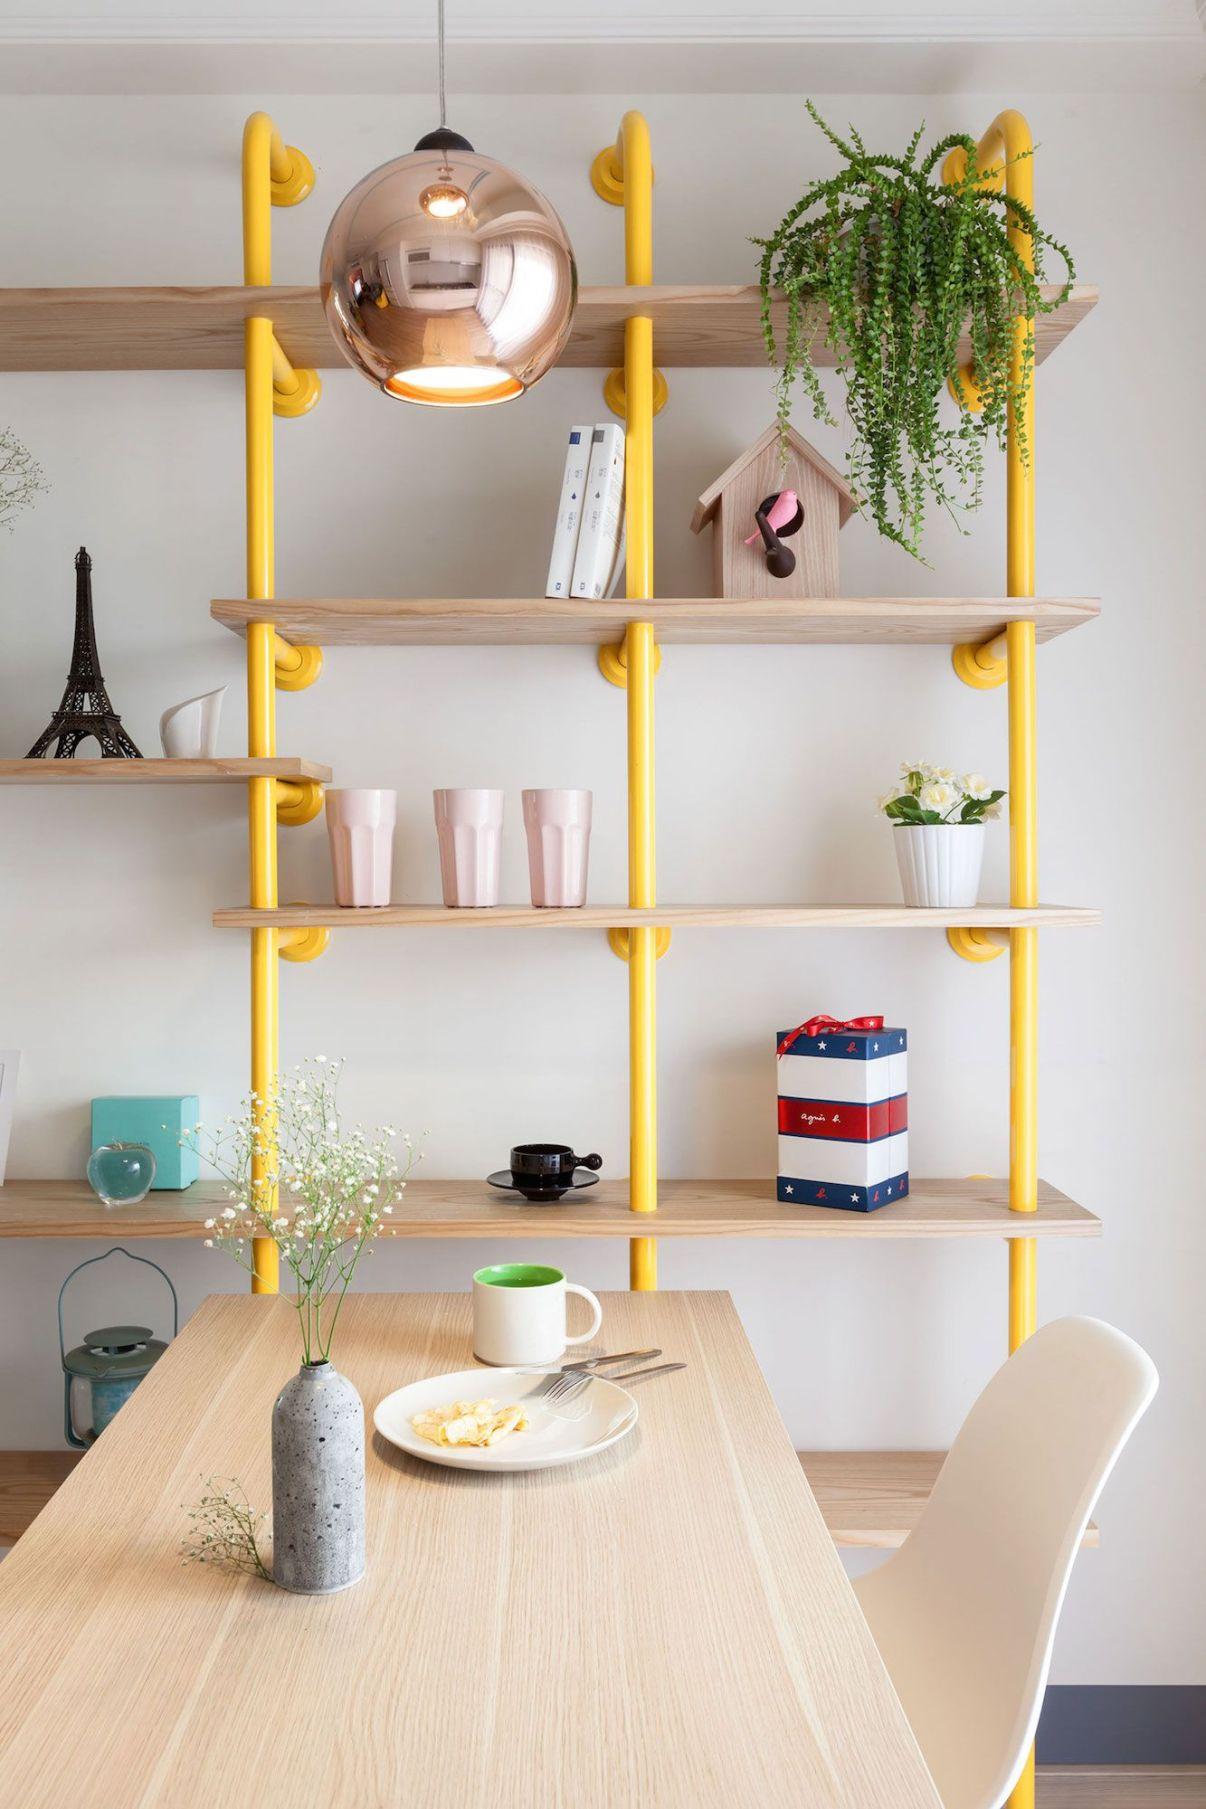 wonderland-apartment-by-house-design-studio-14.jpg